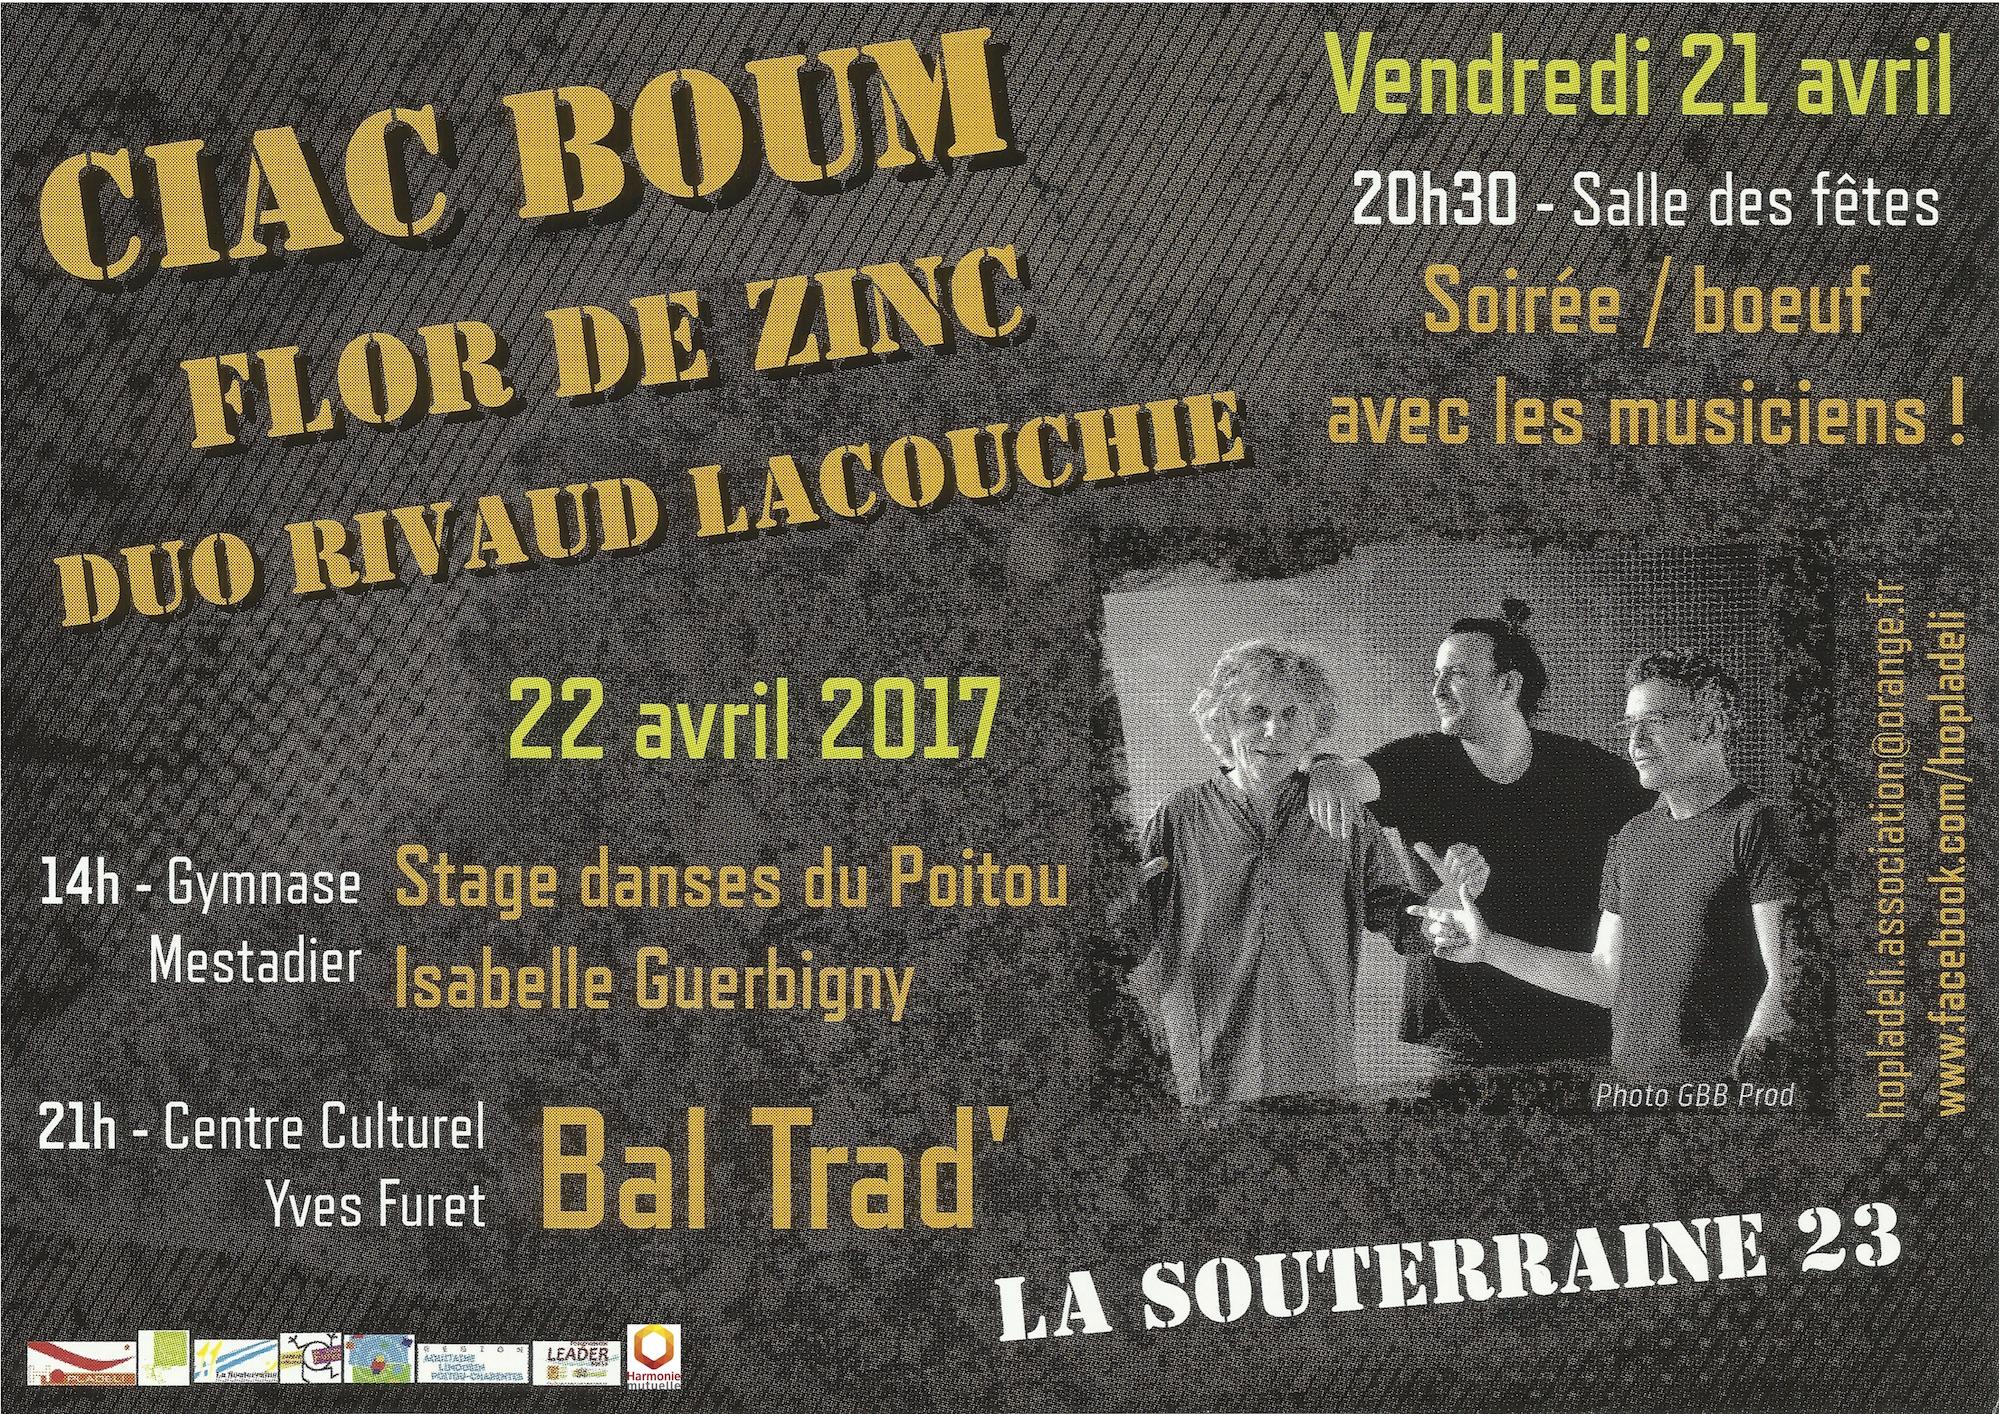 soiree-boeuf-ciac-boum_16893